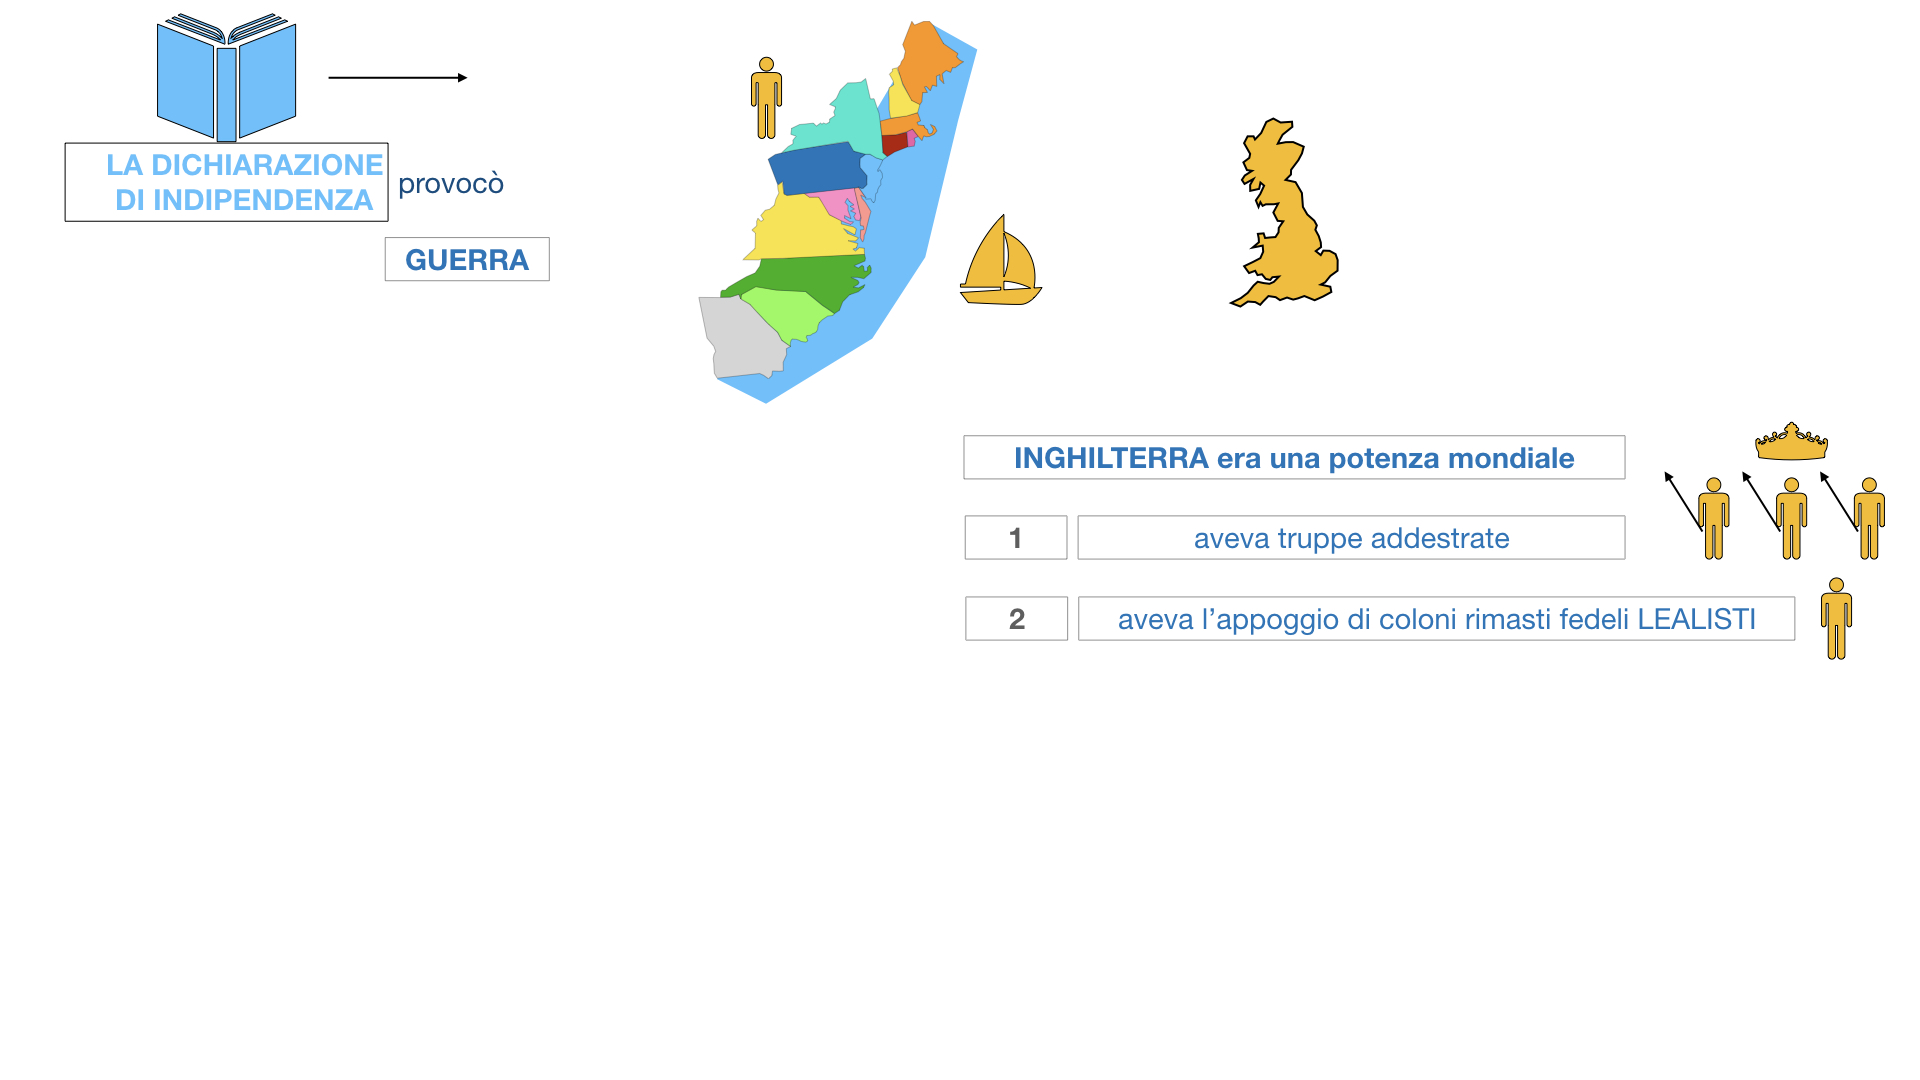 GUERRA DI INDIPENDENZA AMERICANA_SIMULAZIONE.107